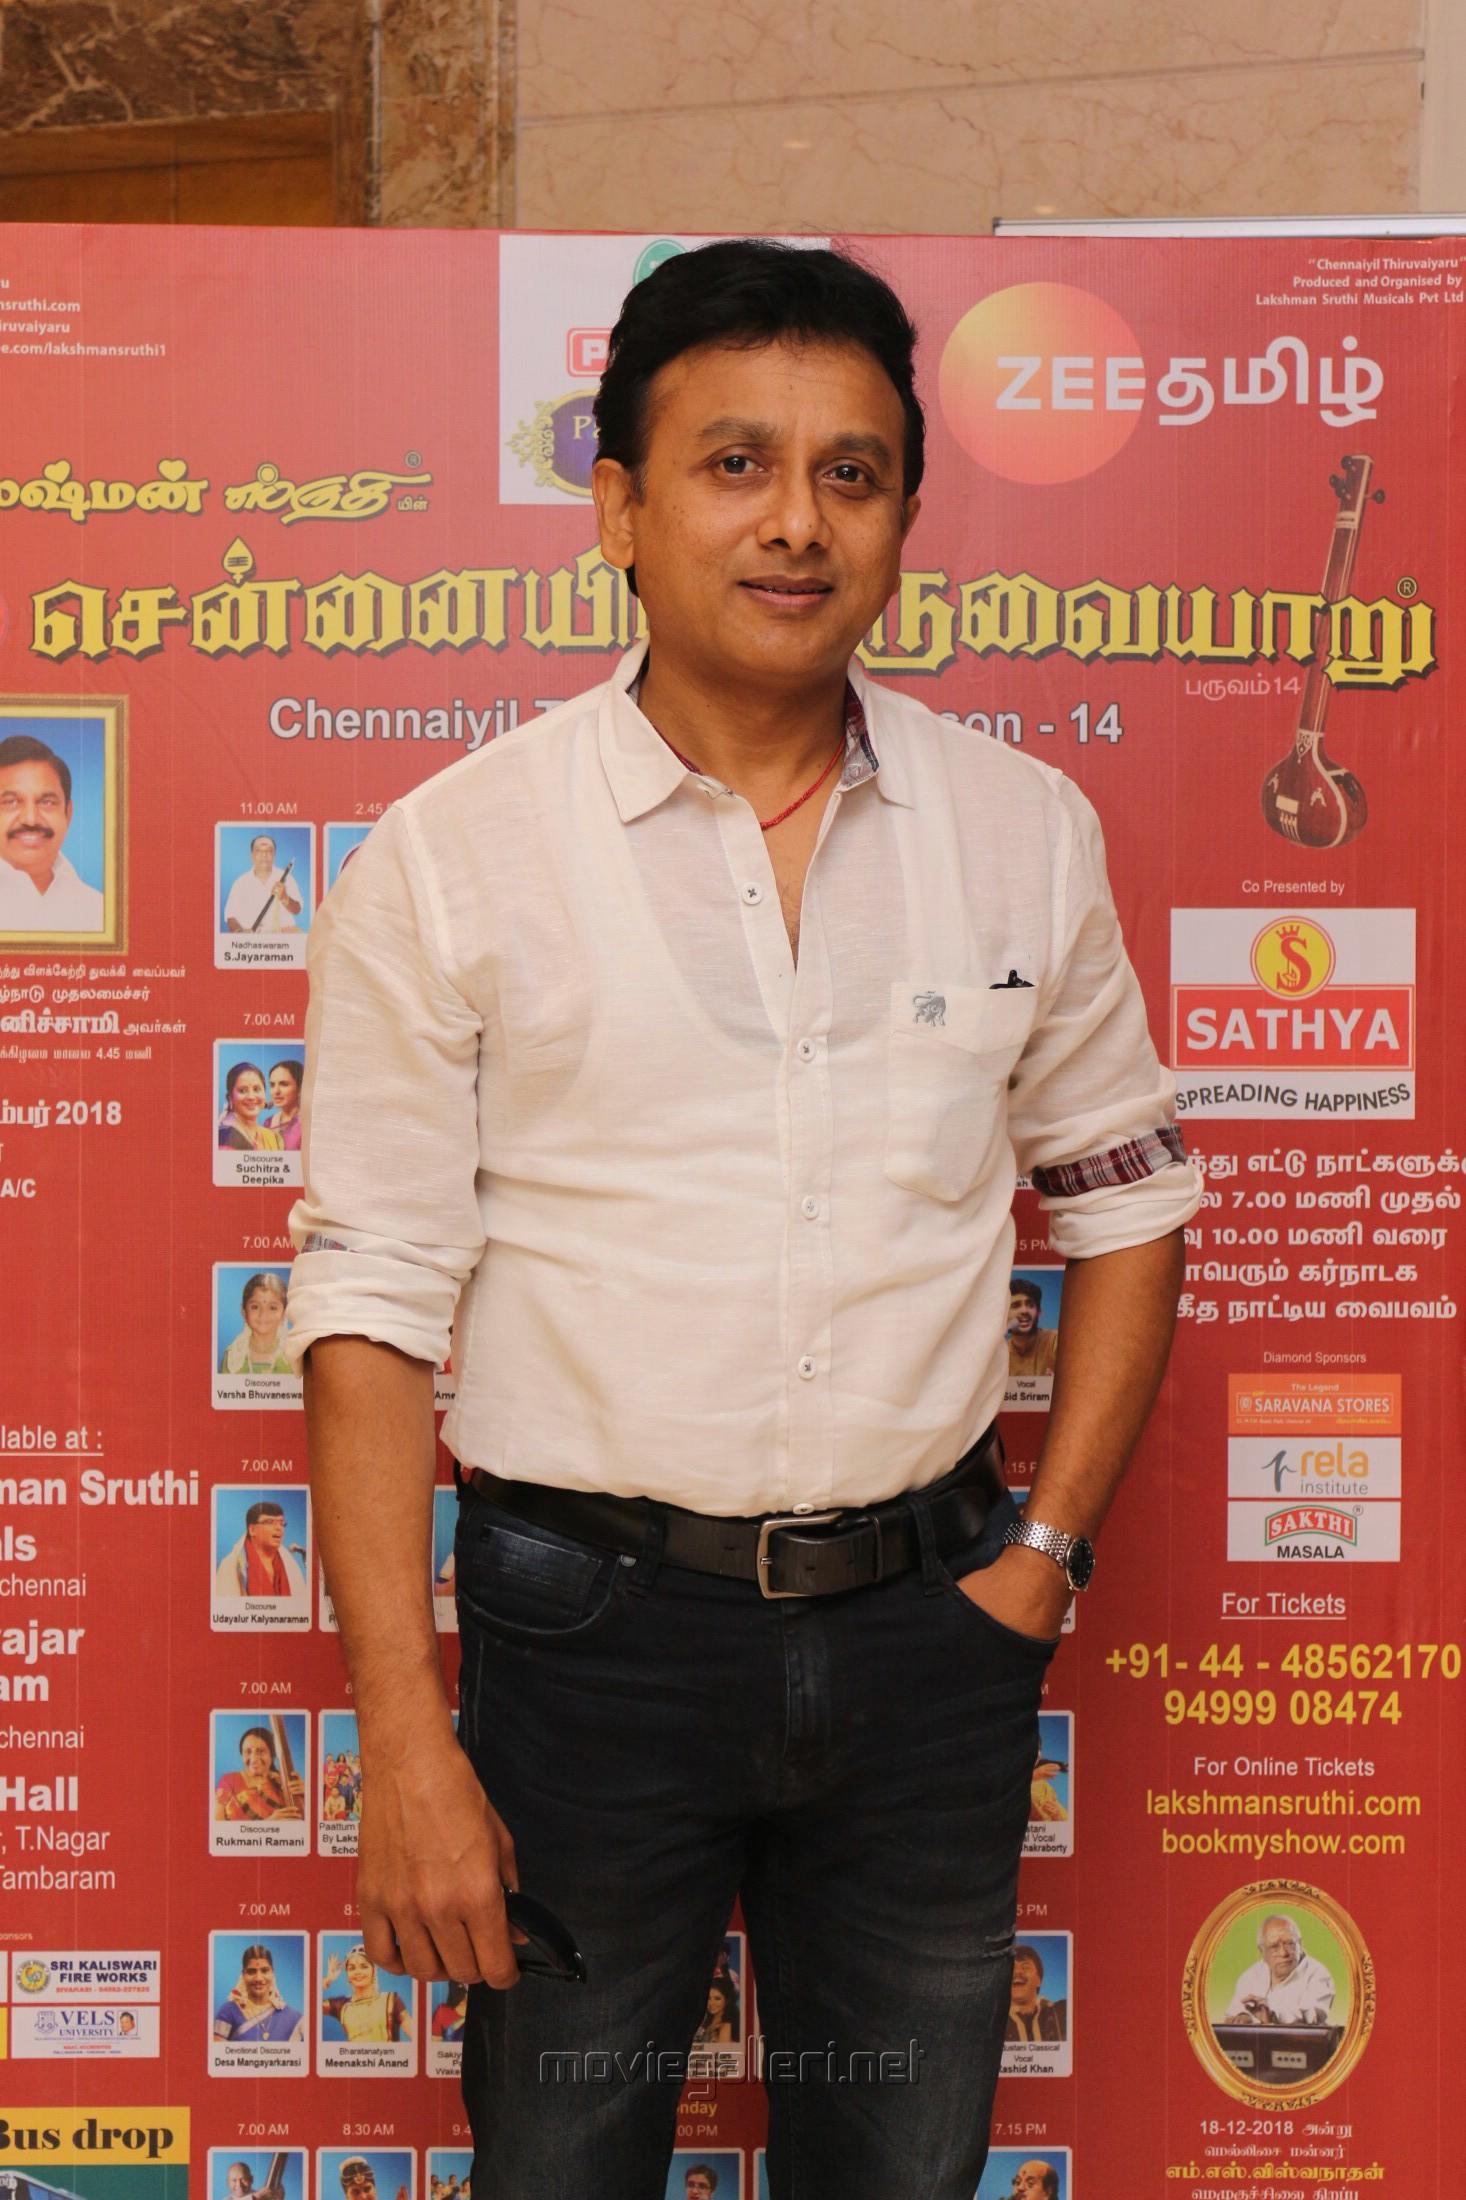 P Unnikrishnan @ Chennaiyil Thiruvaiyaru 2018 Season 14 Press Meet Stills